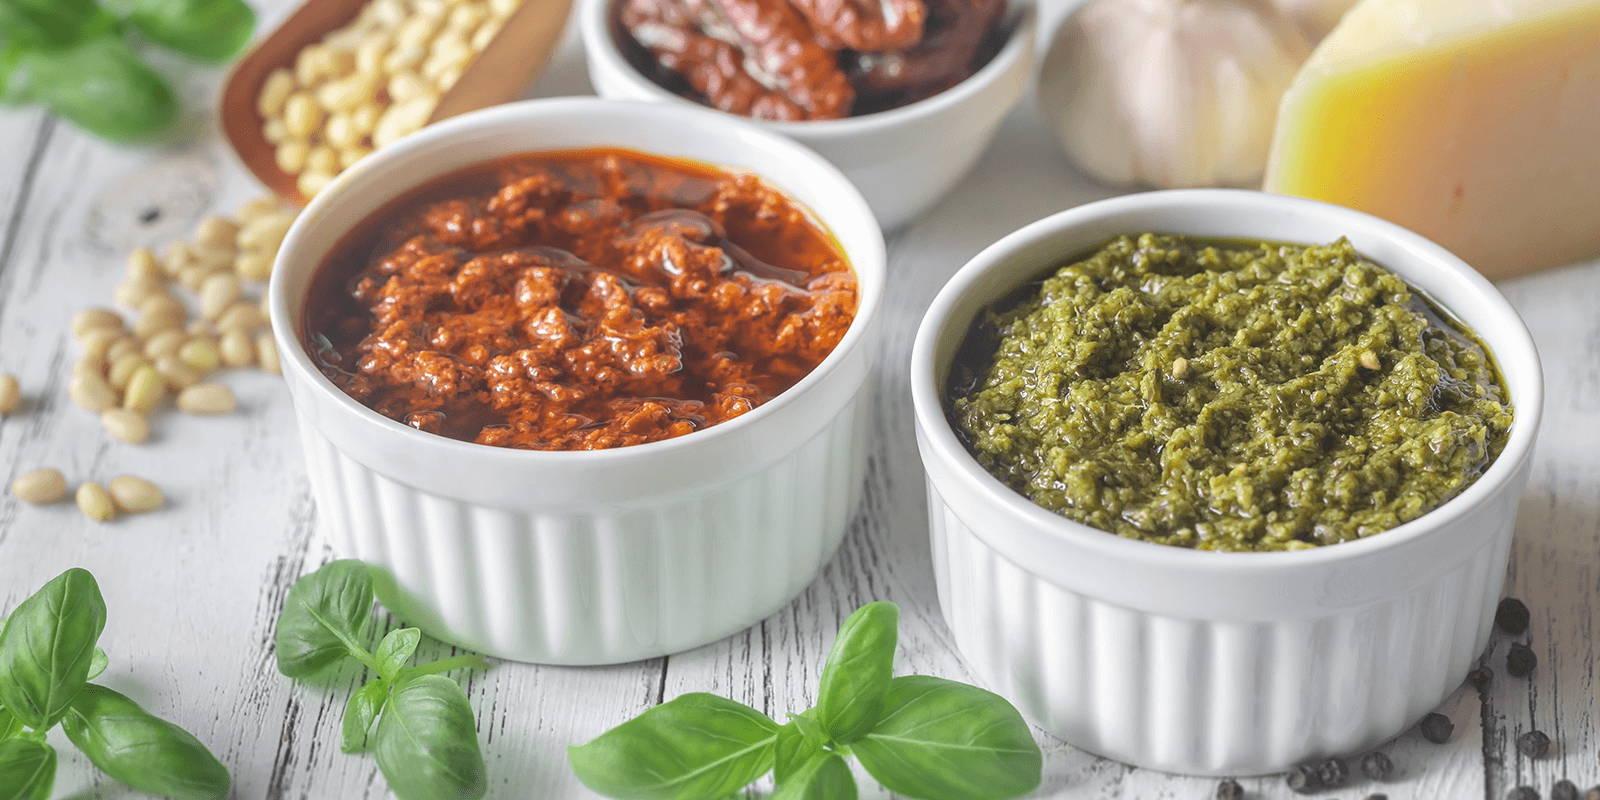 Red pesto and green pesto